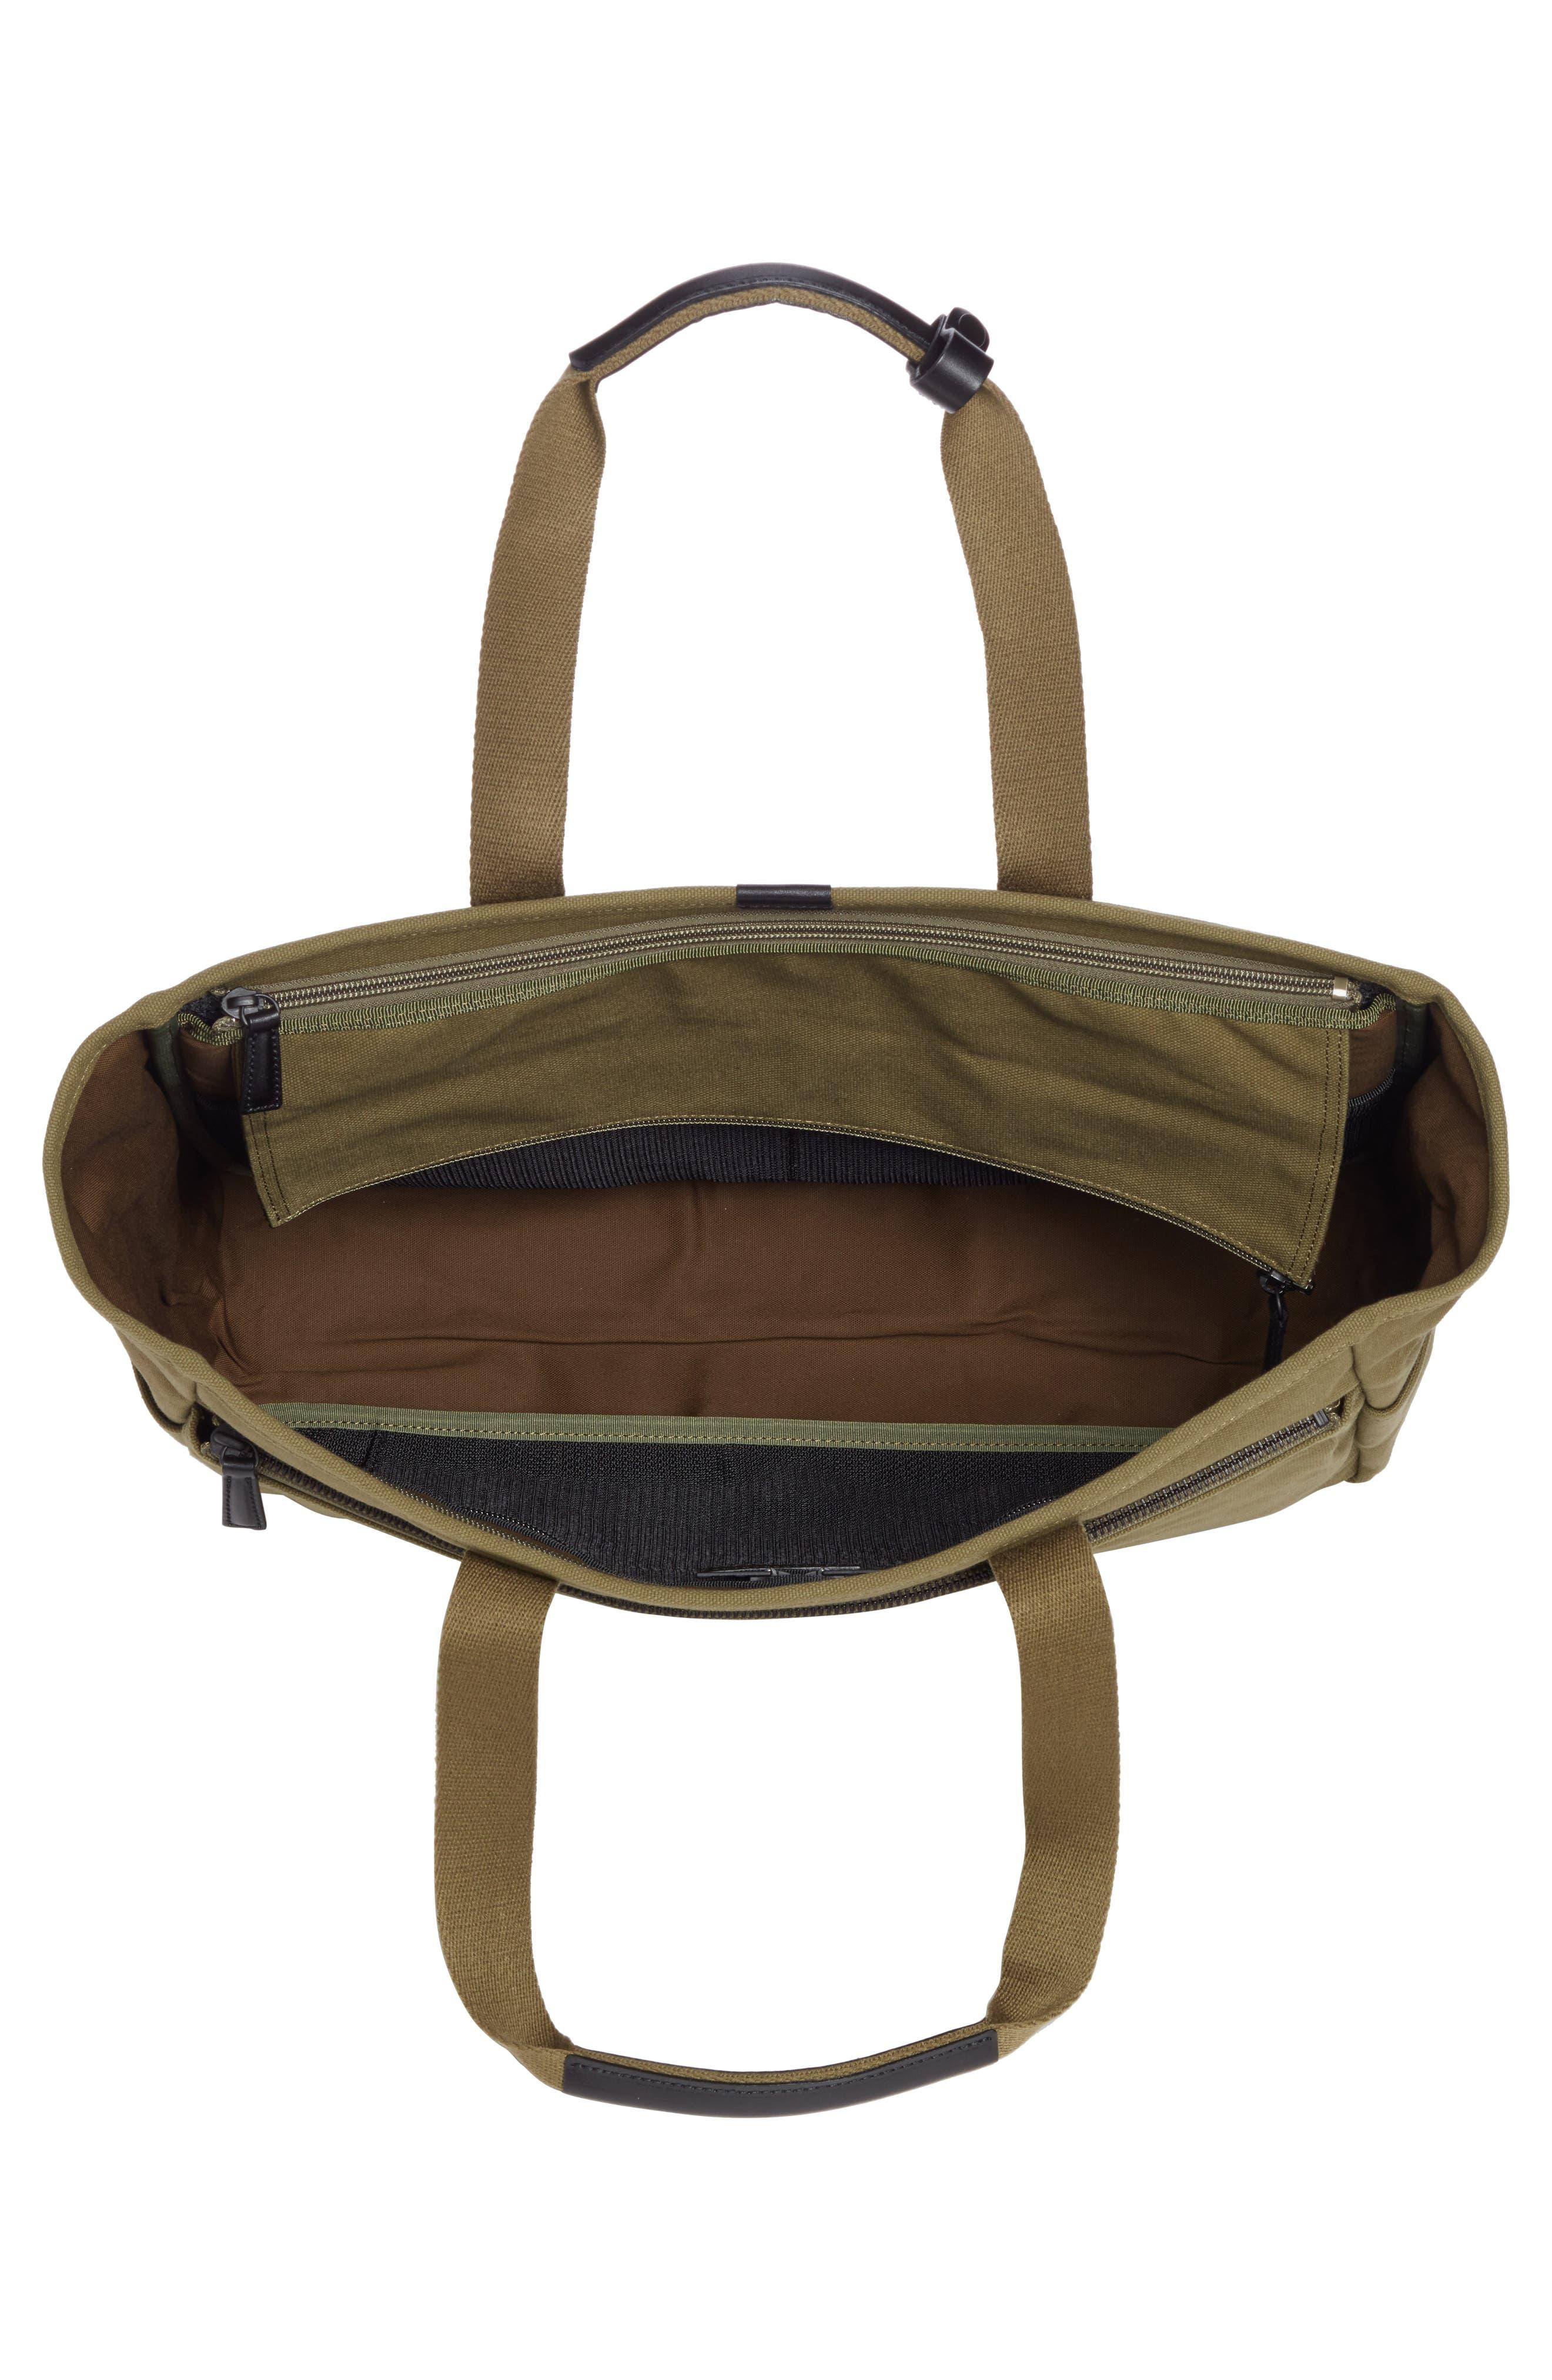 x Porter Travel Tote Bag,                             Alternate thumbnail 4, color,                             OLIVE